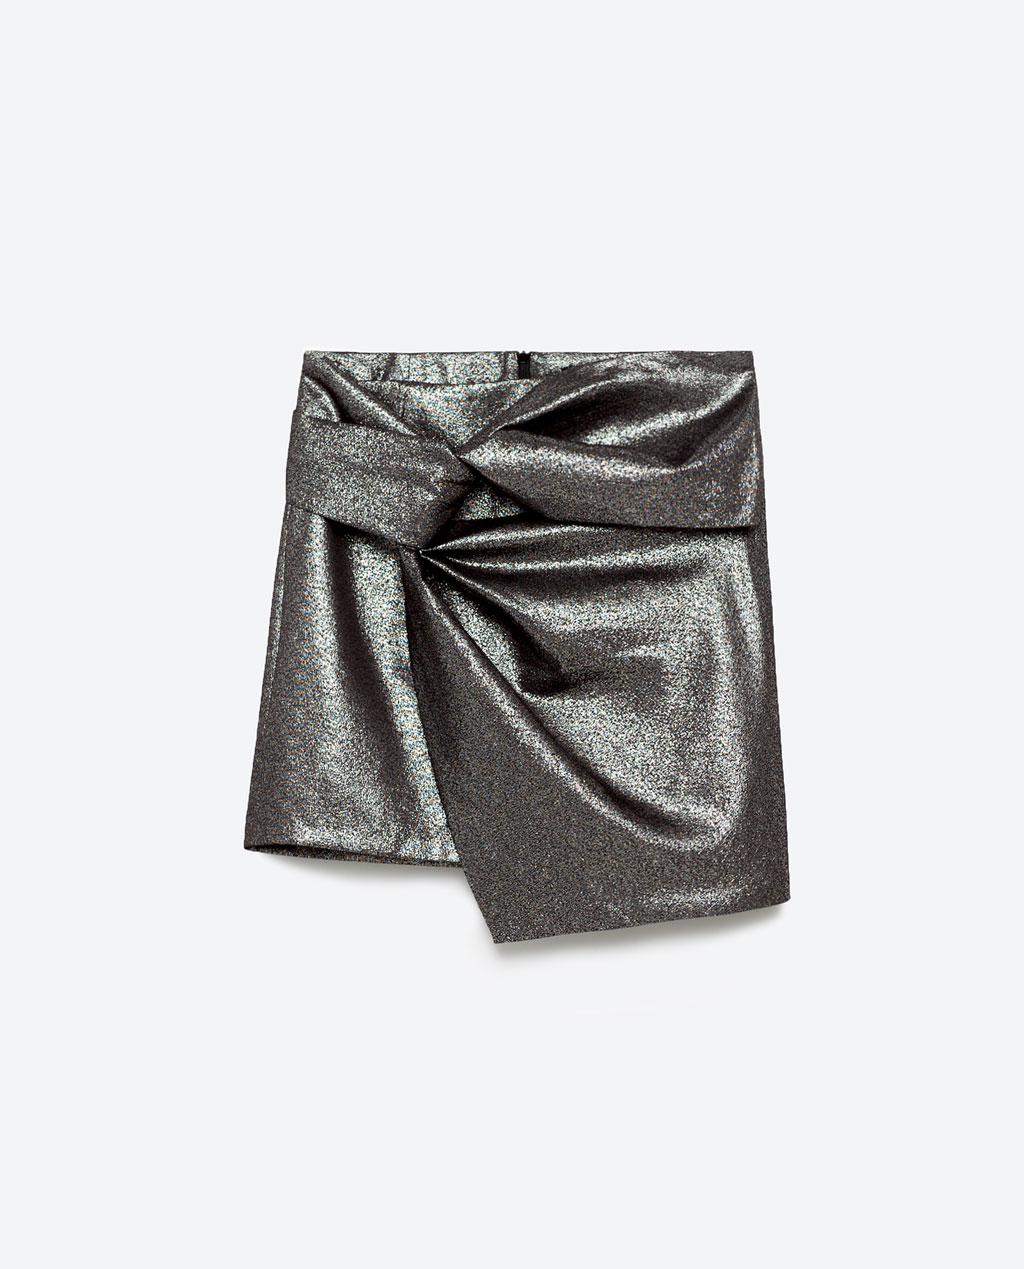 http://www.zara.com/us/en/sale/woman/skirts/view-all/shiny-skirt-c732033p3992010.html